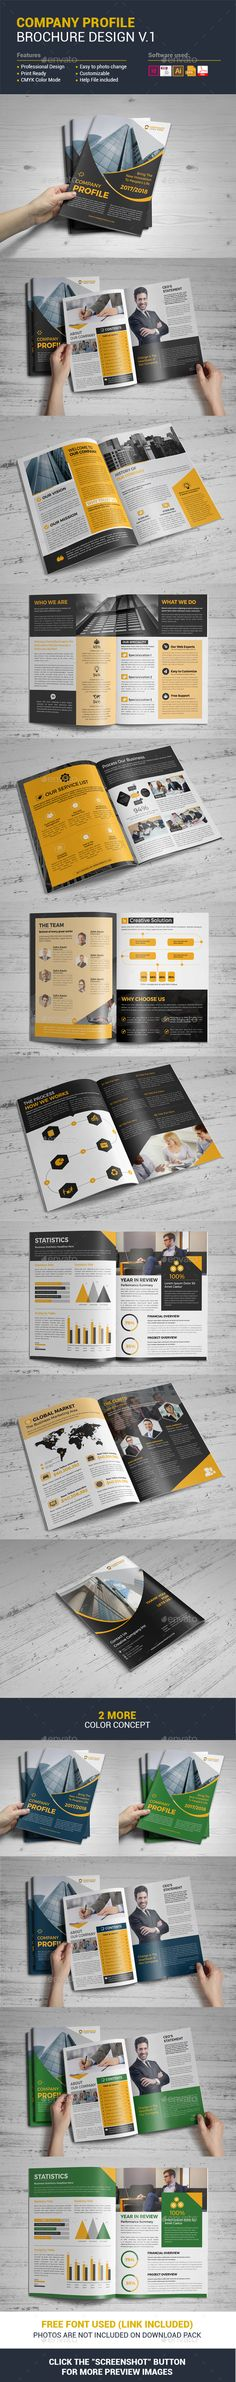 Company Profile Template, Company Profile Design, Indesign Templates, Brochure Template, Peacock Art, Ai Illustrator, Architecture Quotes, Creative Company, Catalog Design